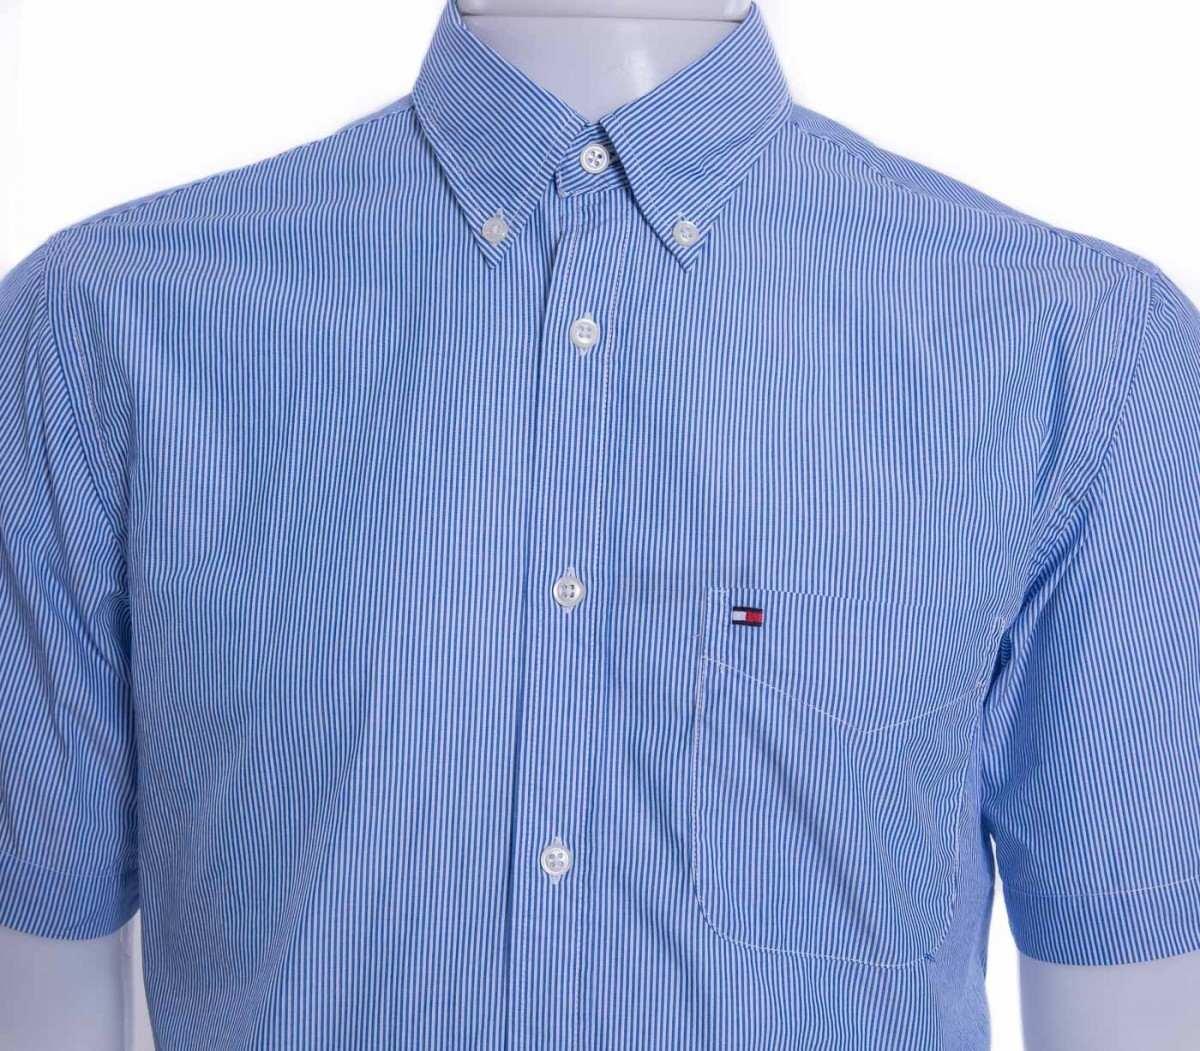 Camisa Social Masculina Tommy Hilfiger Manga Curta Original - R  215 ... 0668029f593be